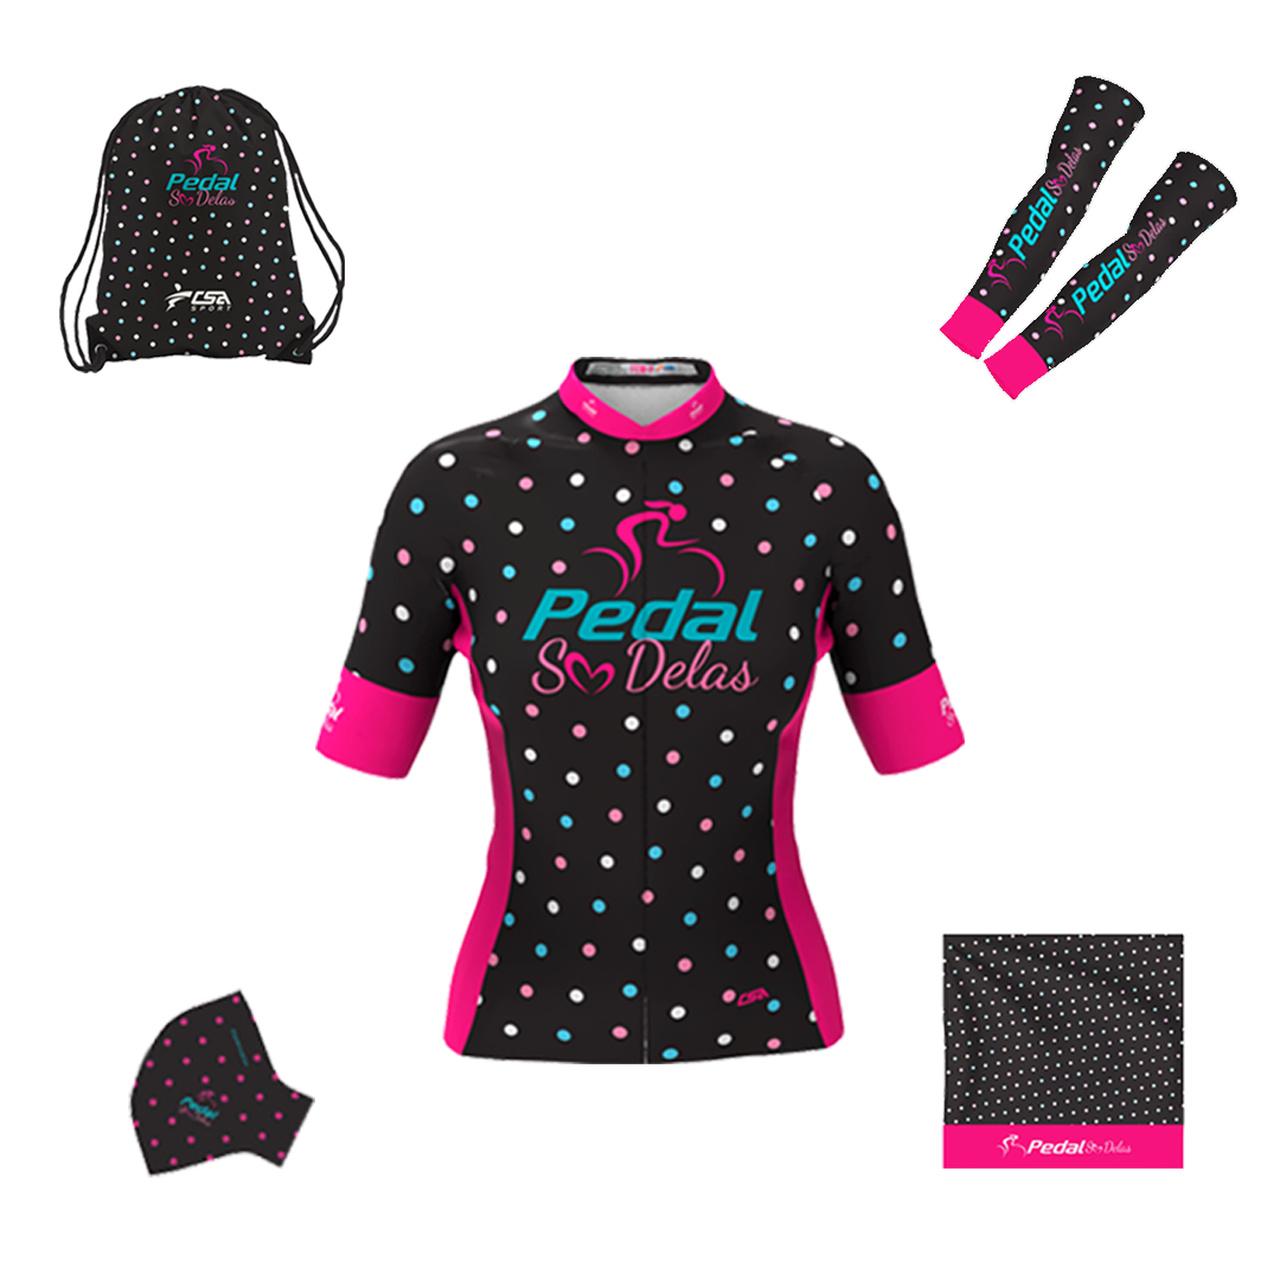 Kit Especial Pedal Só Delas